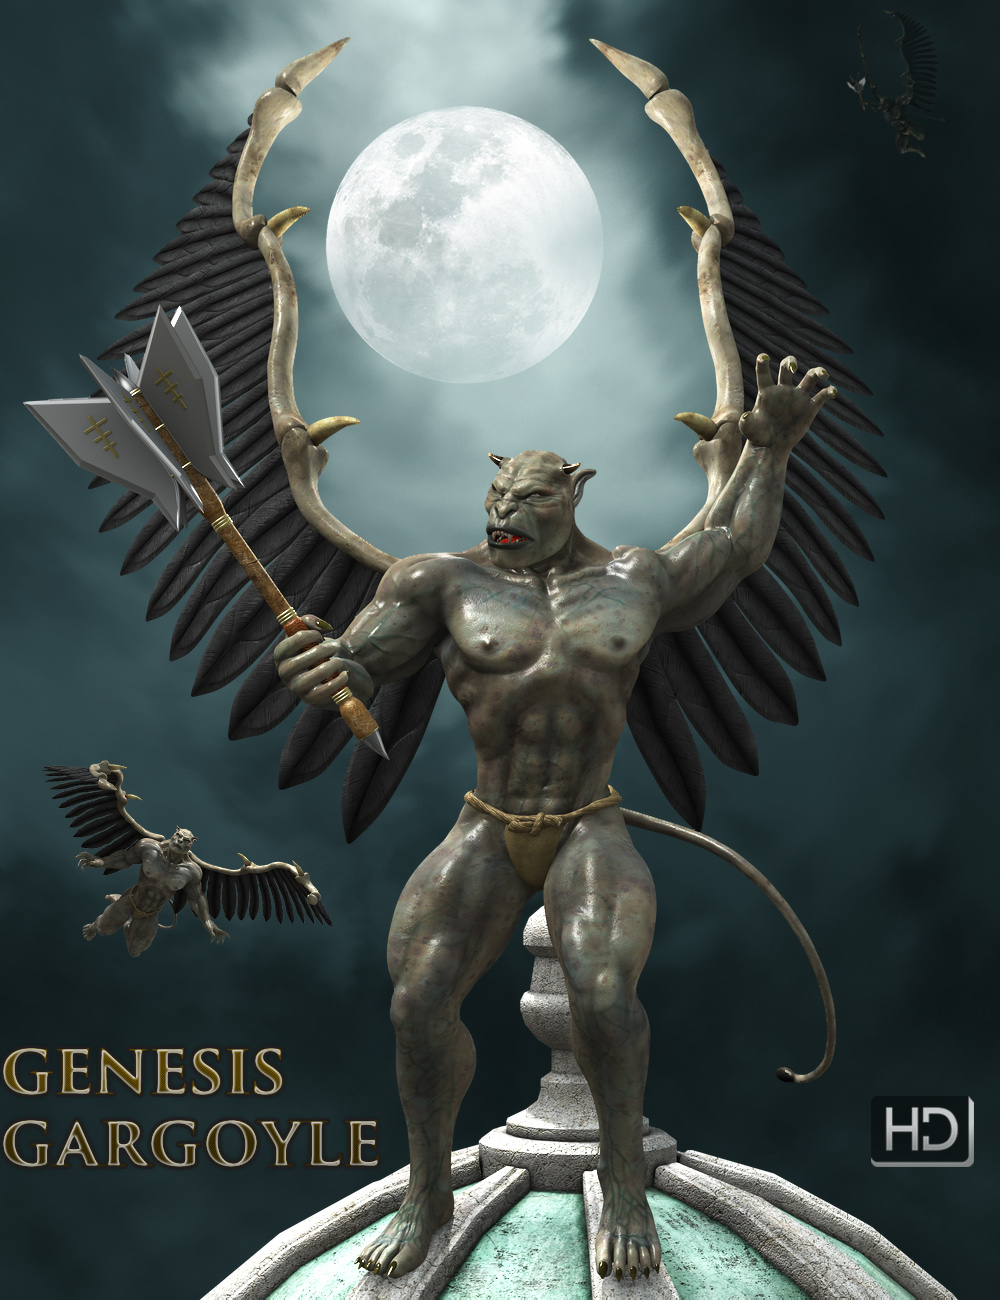 Genesis Gargoyle HD by: midnight_stories, 3D Models by Daz 3D